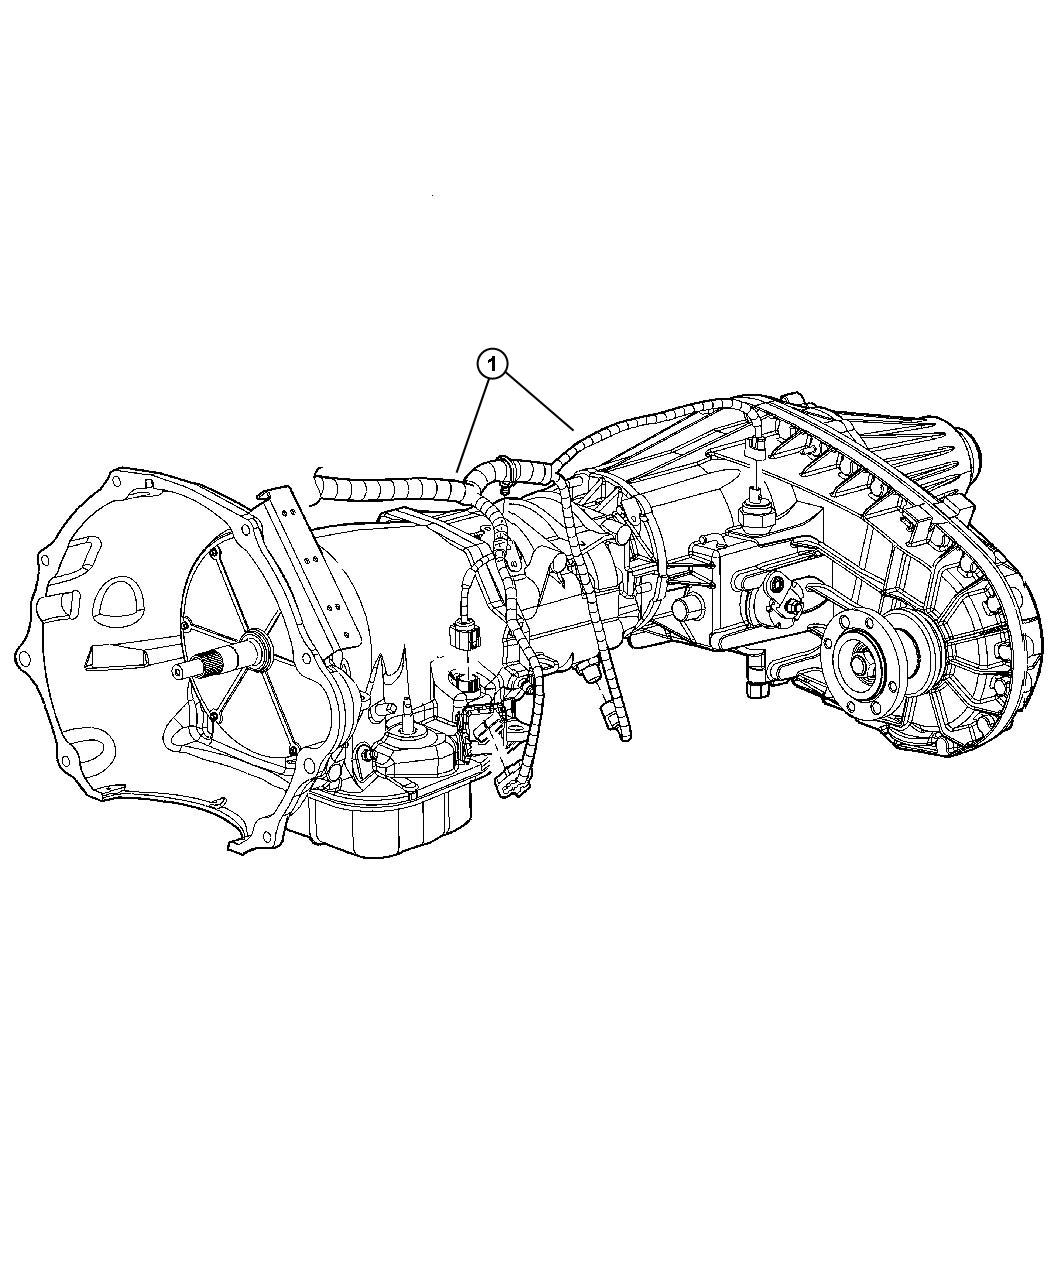 tags: #dodge dakota transmission problems#92 dodge transmission diagram# dodge dakota transmission diagram#dodge caravan transmission diagram#dodge  automatic